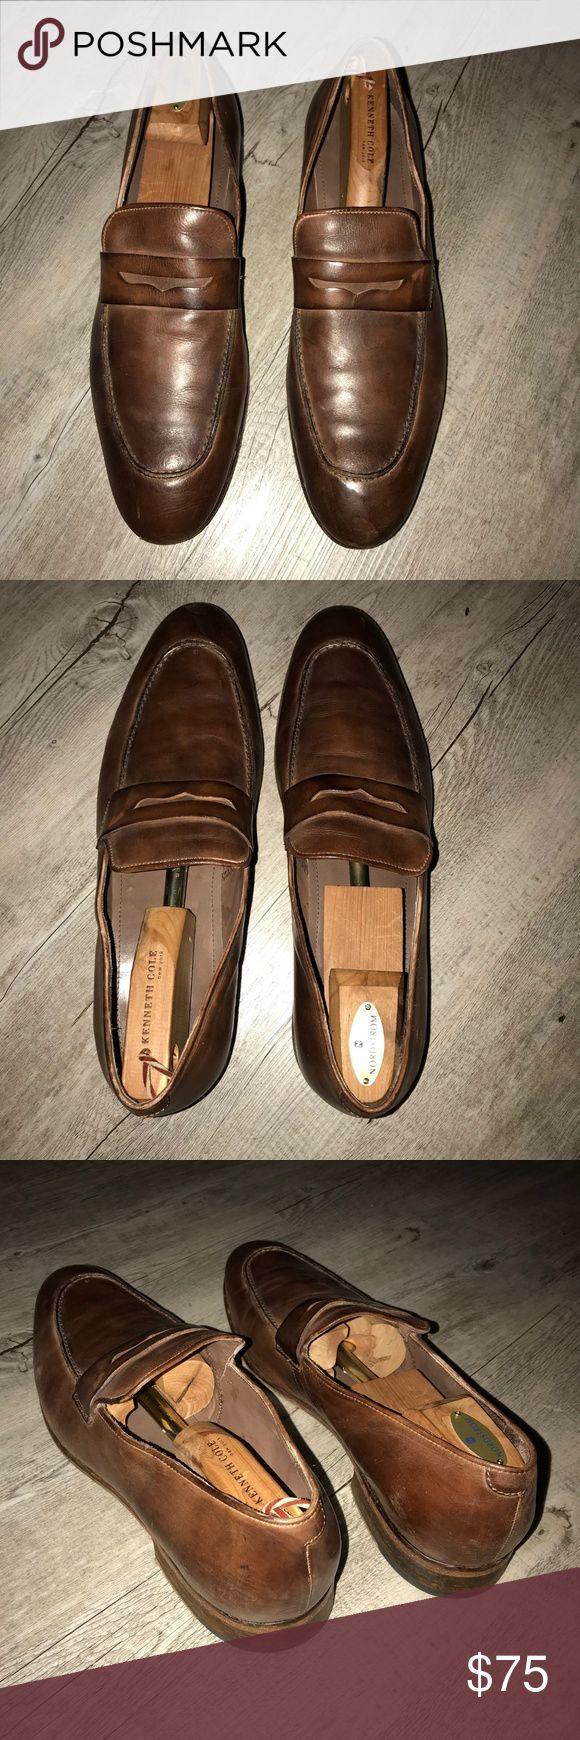 Donald J Pliner Men's Brown Loafer Donald J Pliner Men's Brown Loafer. Amazingly comfortable, sharp-looking dress shoe! Just needs a little polish (see photos). Size 12. Donald J. Pliner Shoes Loafers & Slip-Ons